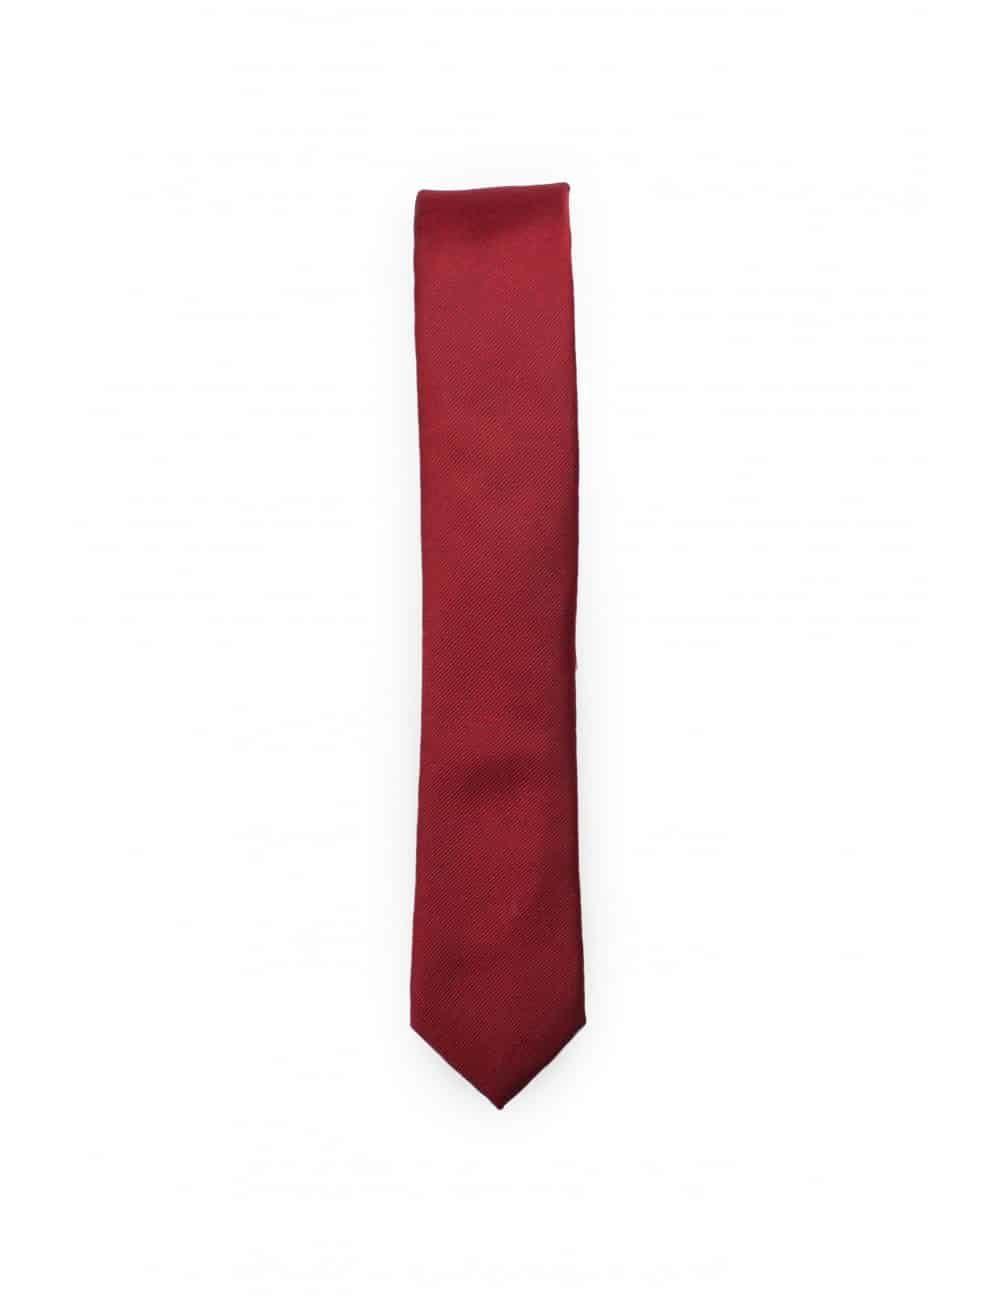 Solid Chilli Pepper Woven Necktie NT18.7